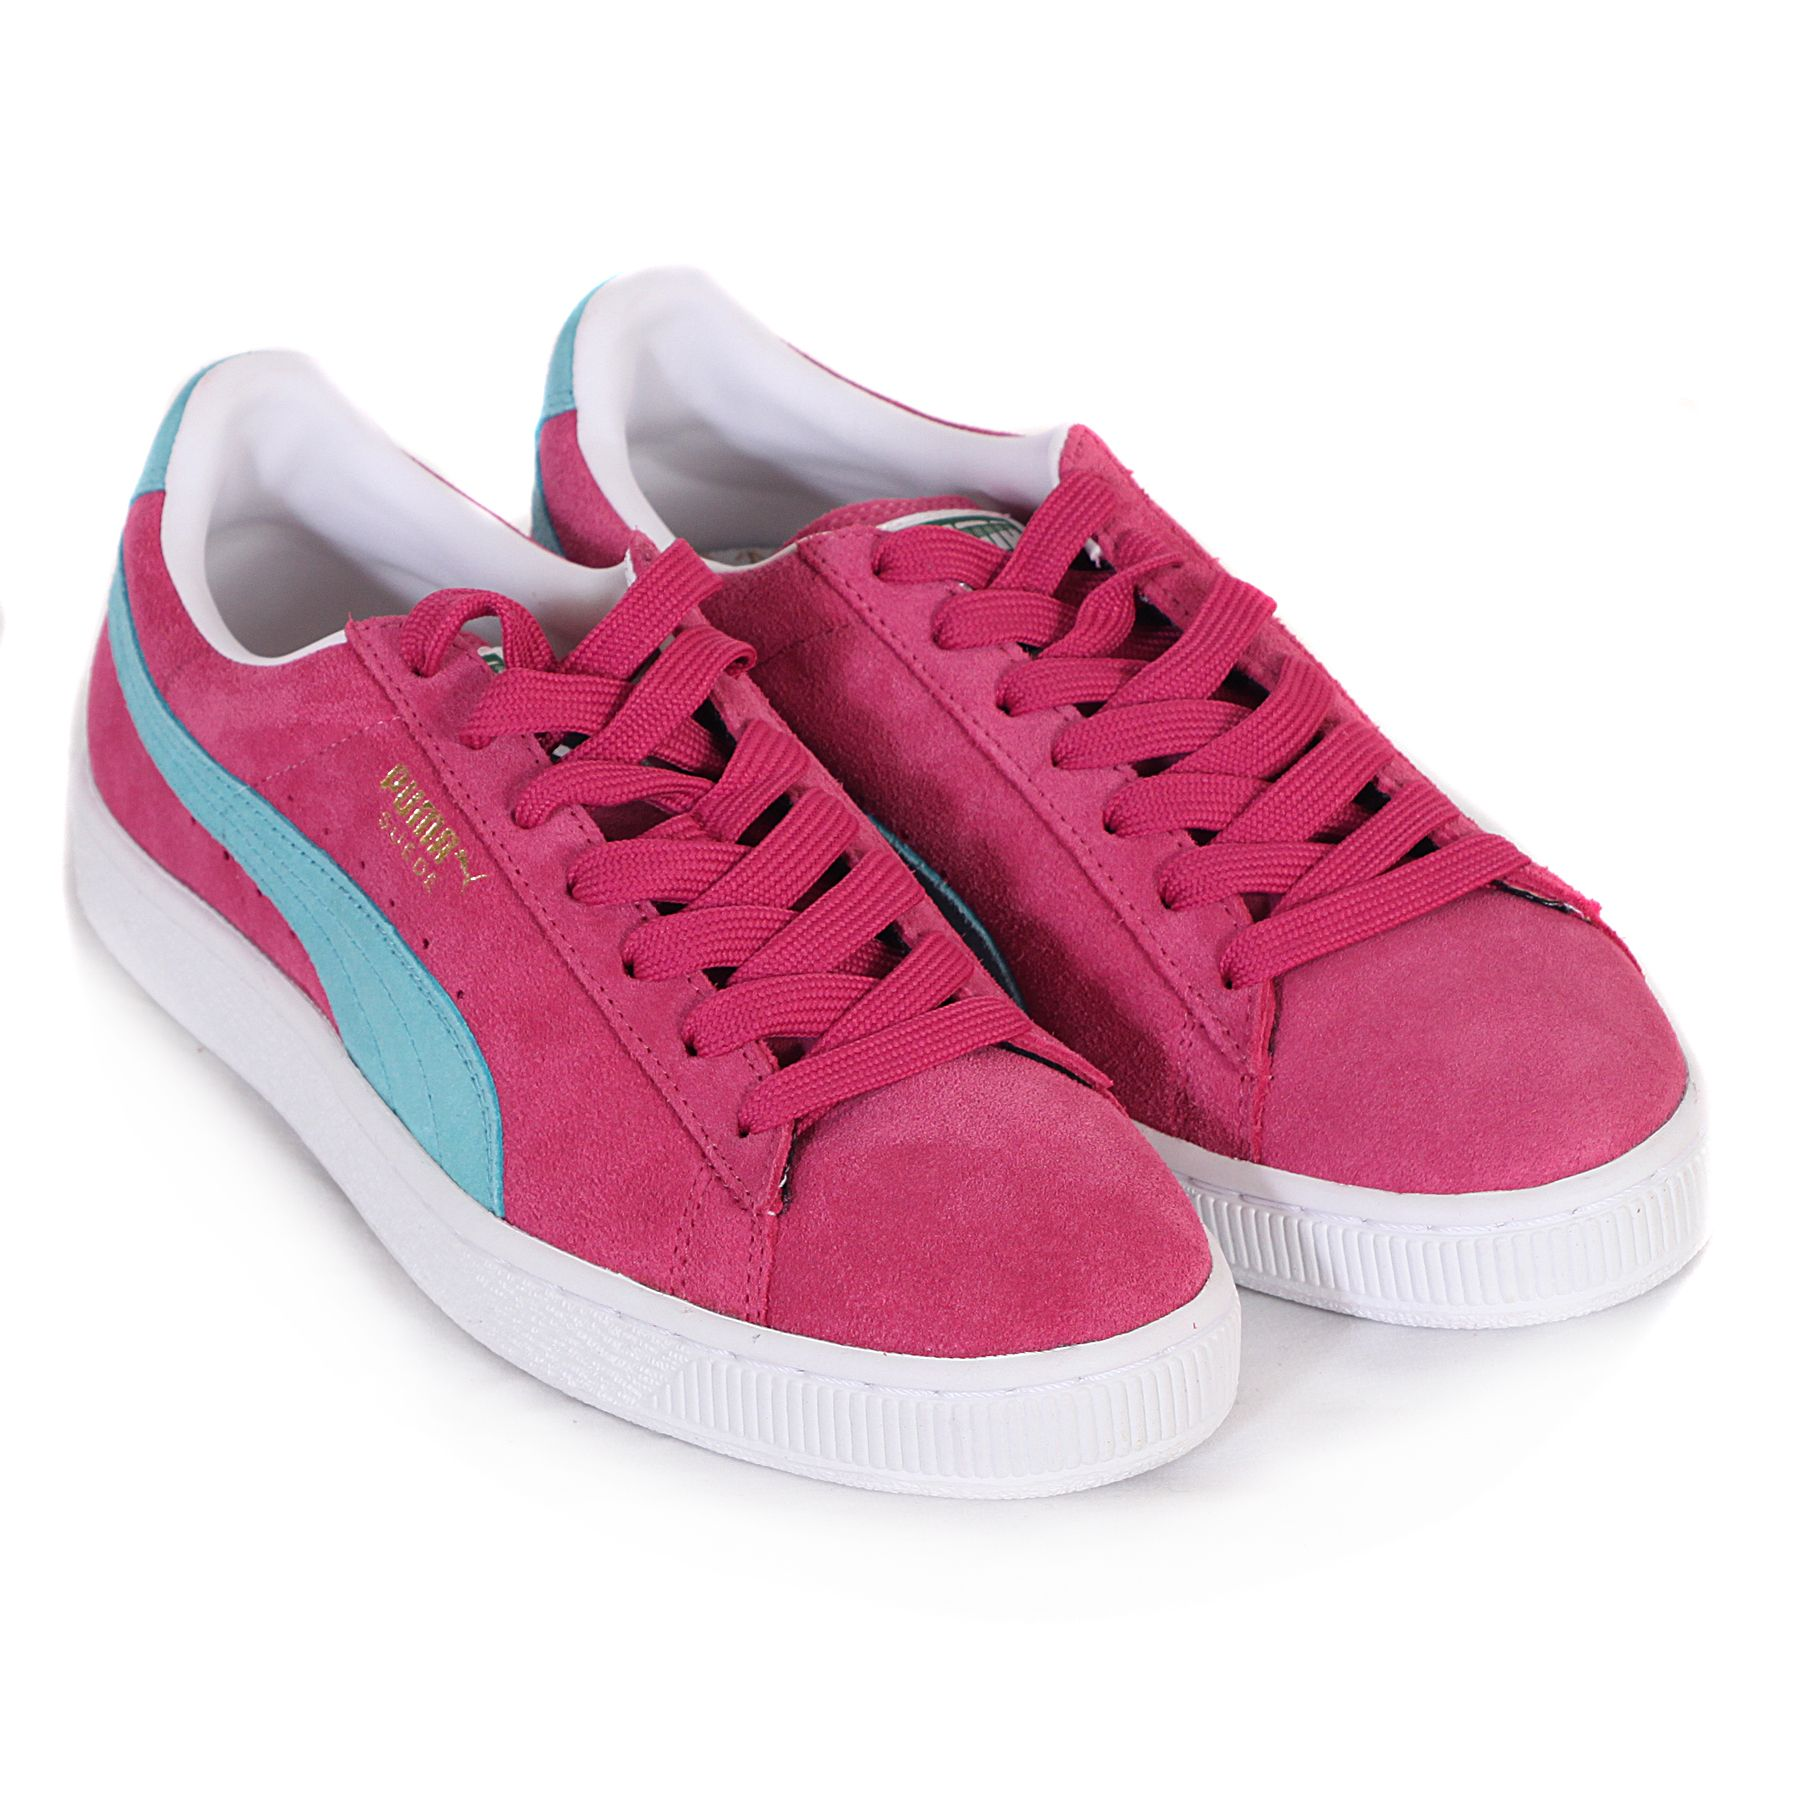 f8e5a8d7eb0e Puma Suede Classics Pink Blue